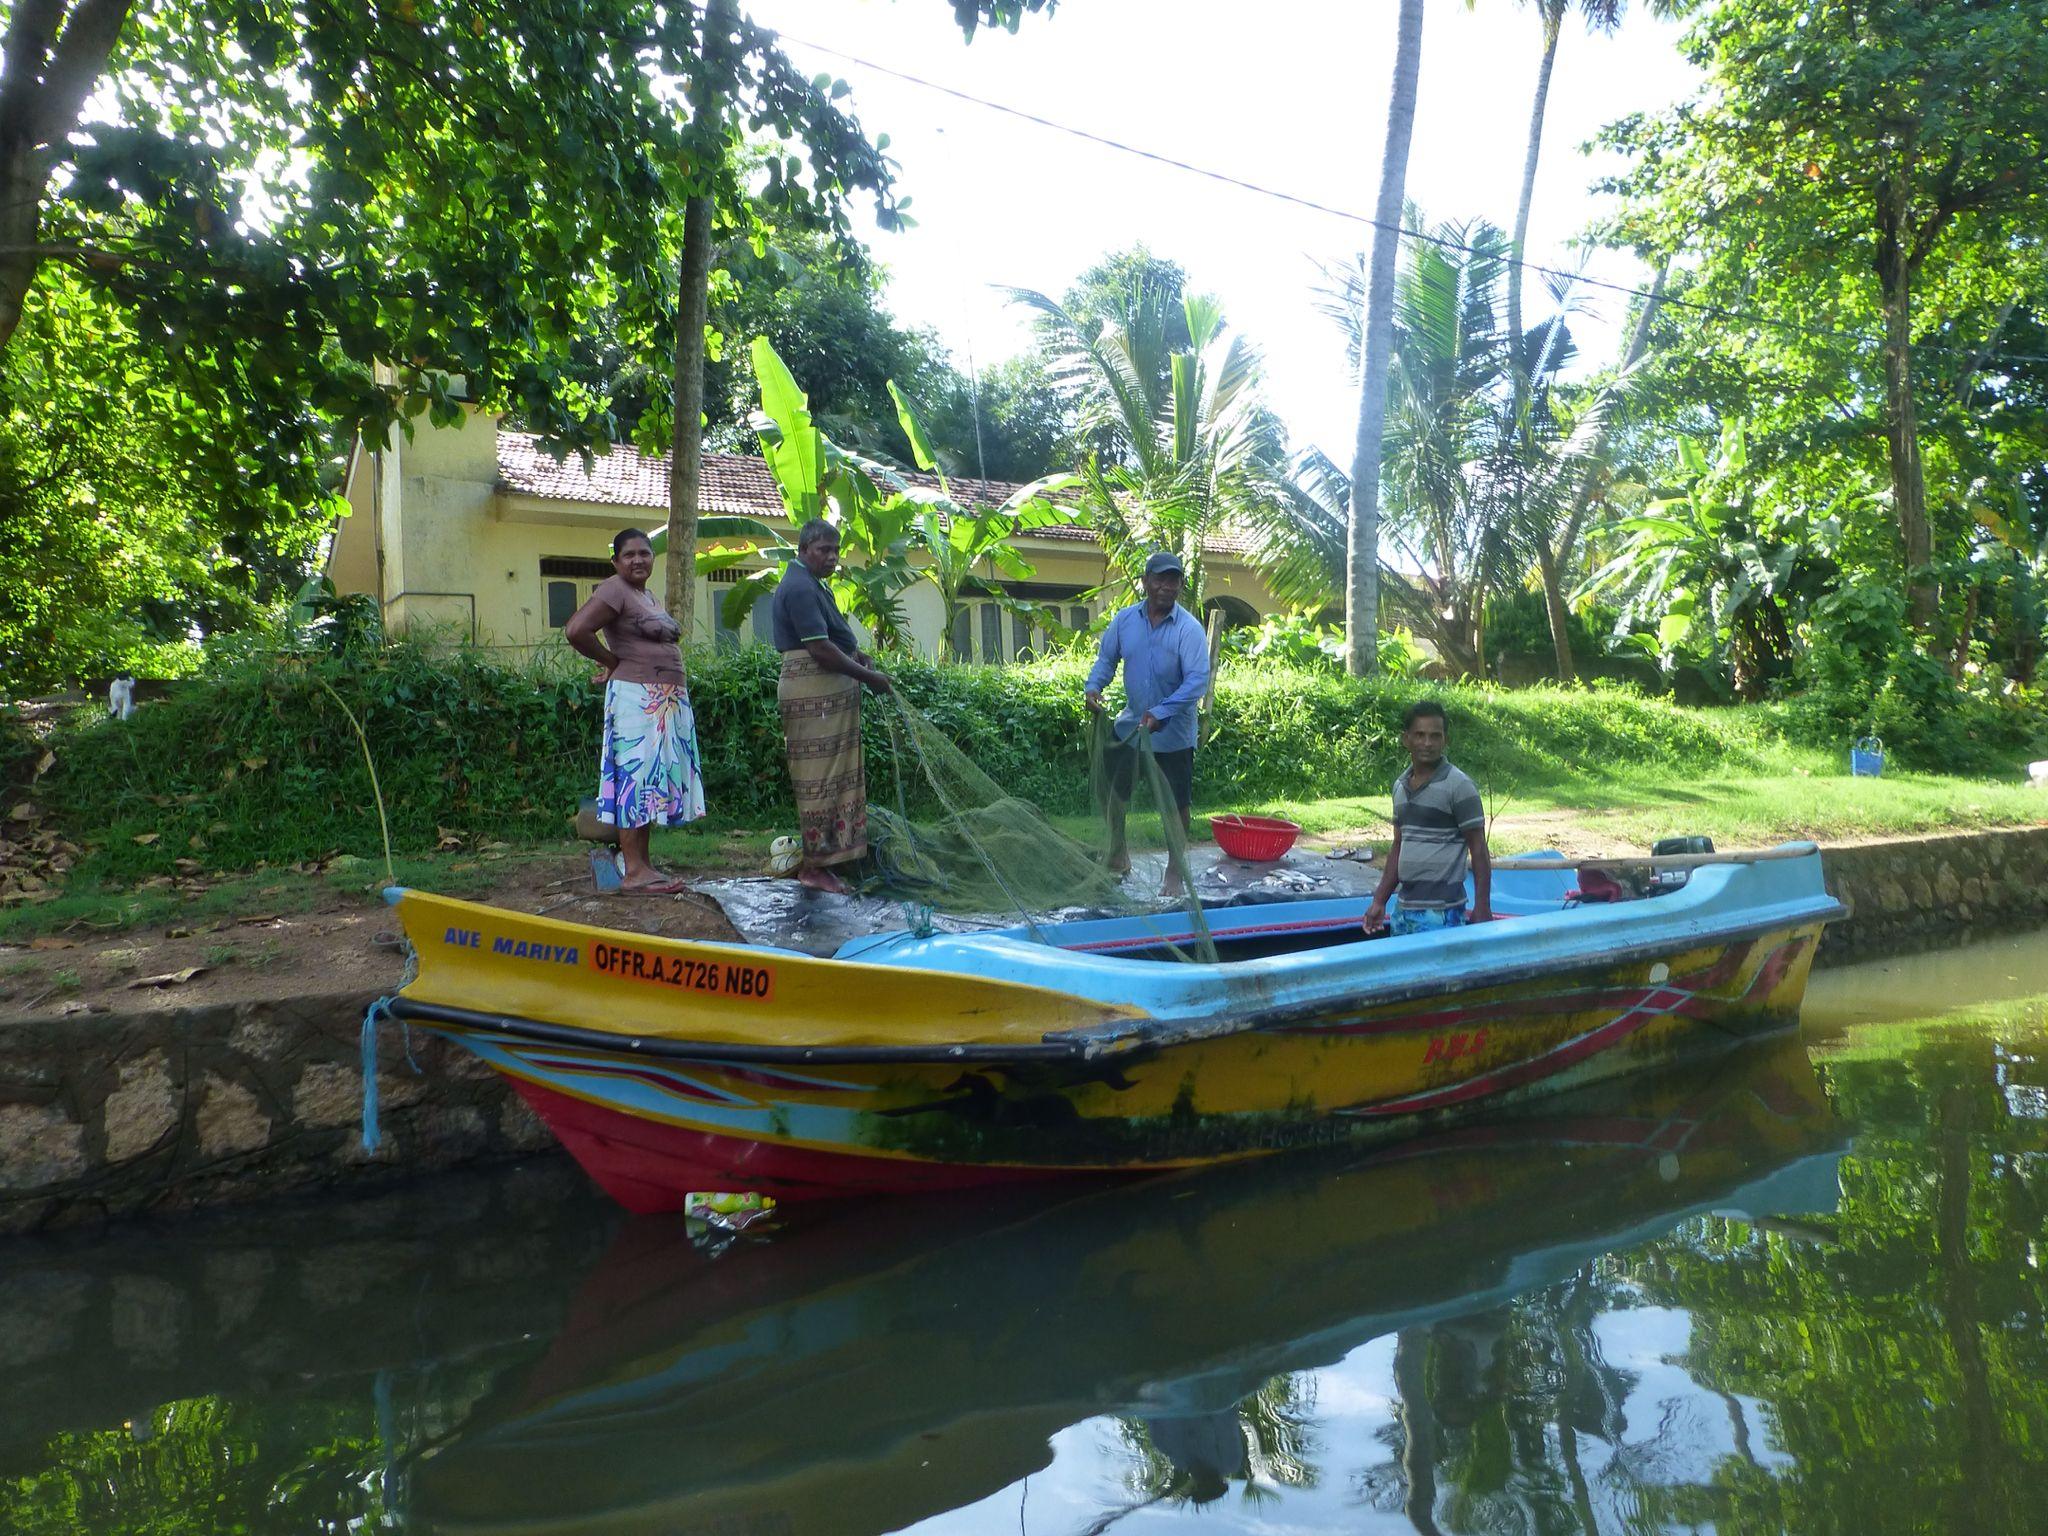 Dutch Canal, Negombo